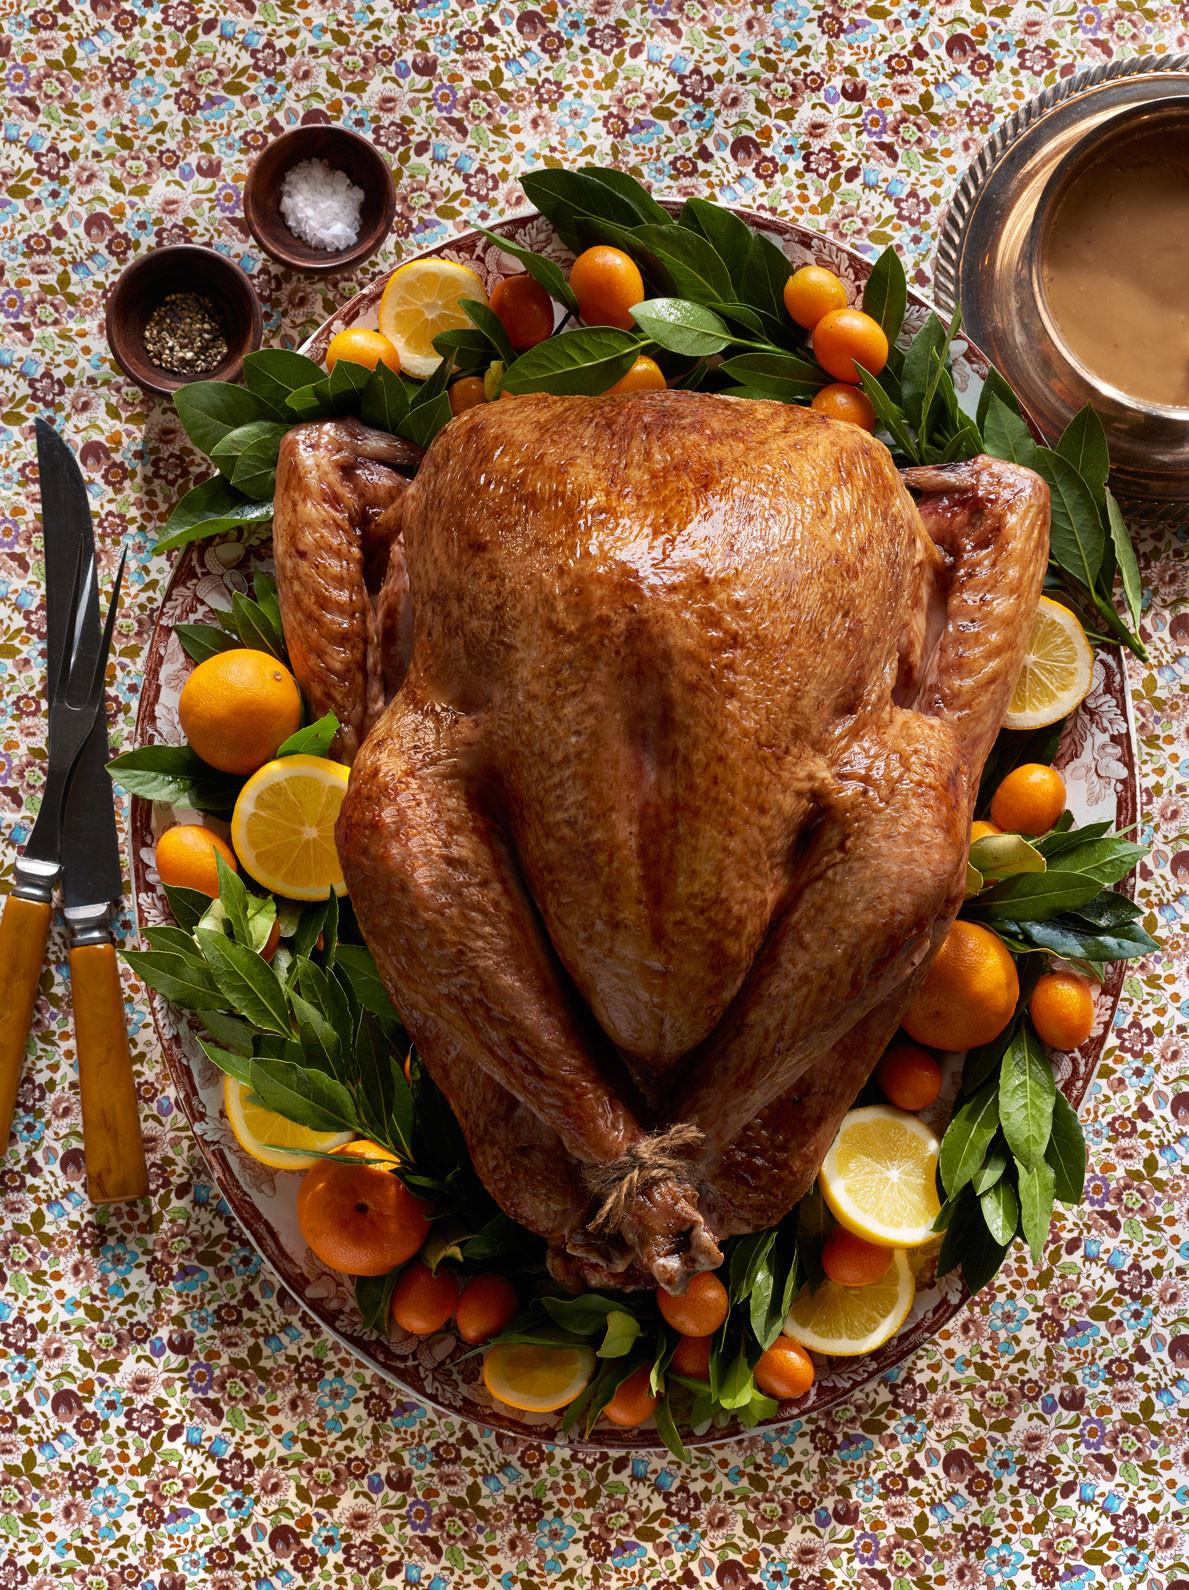 Thanksgiving Turkey Pictures  25 Best Thanksgiving Turkey Recipes How To Cook Turkey